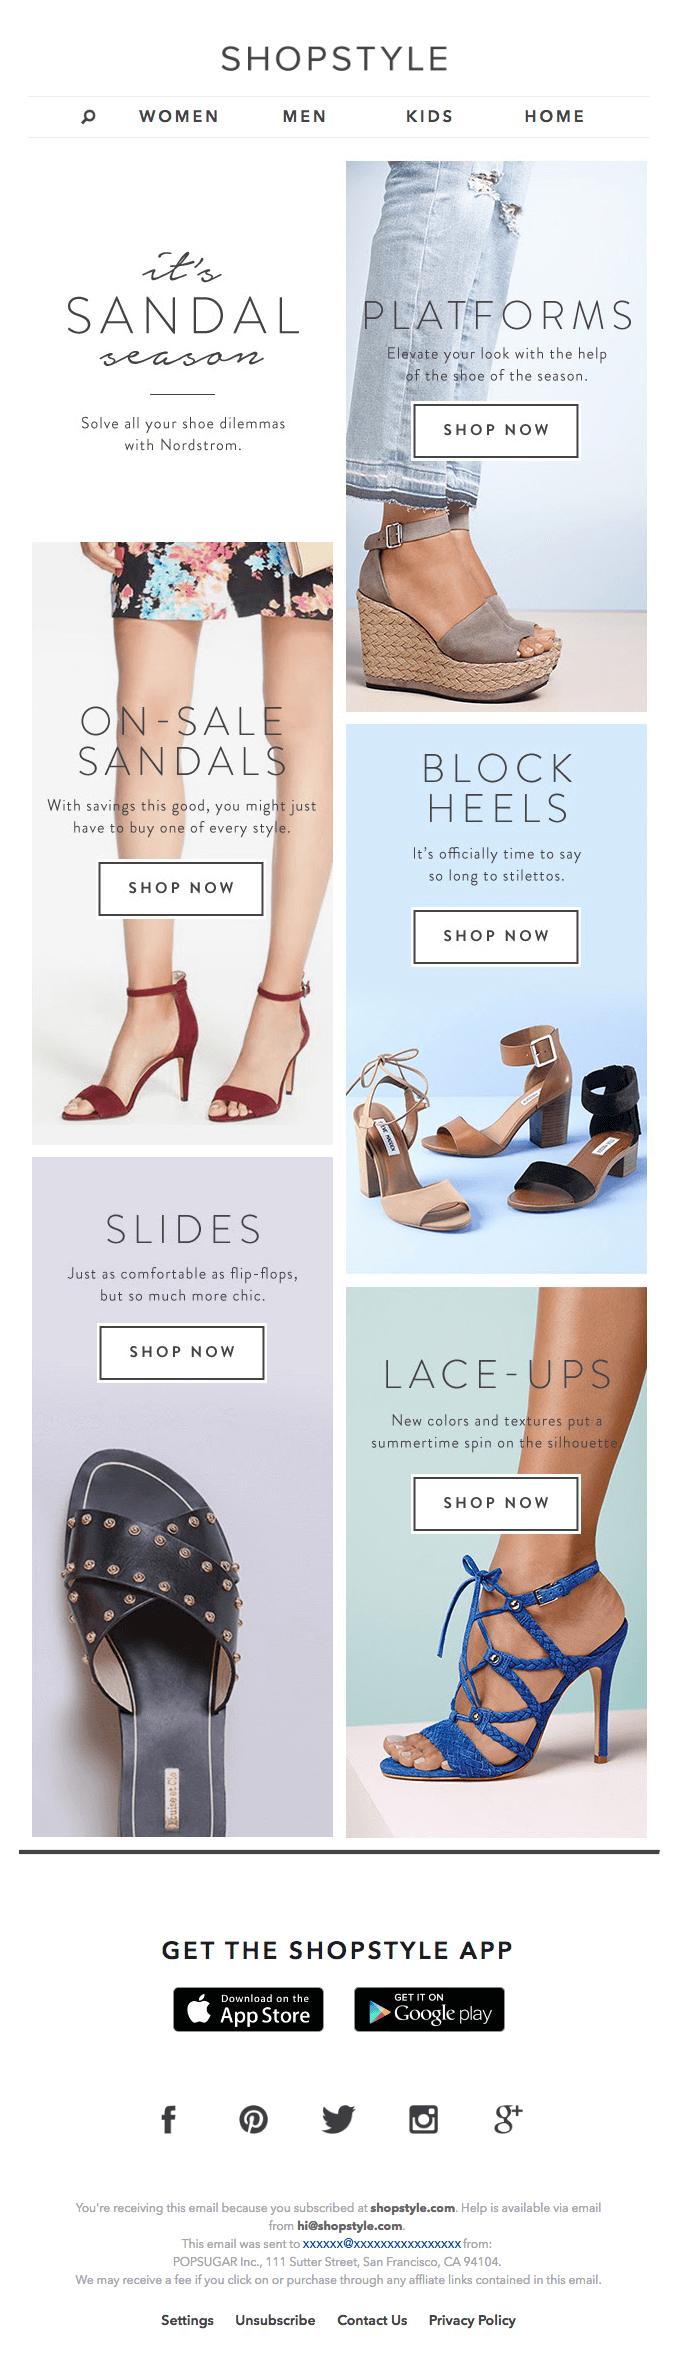 ShopStyle Segmented Emails